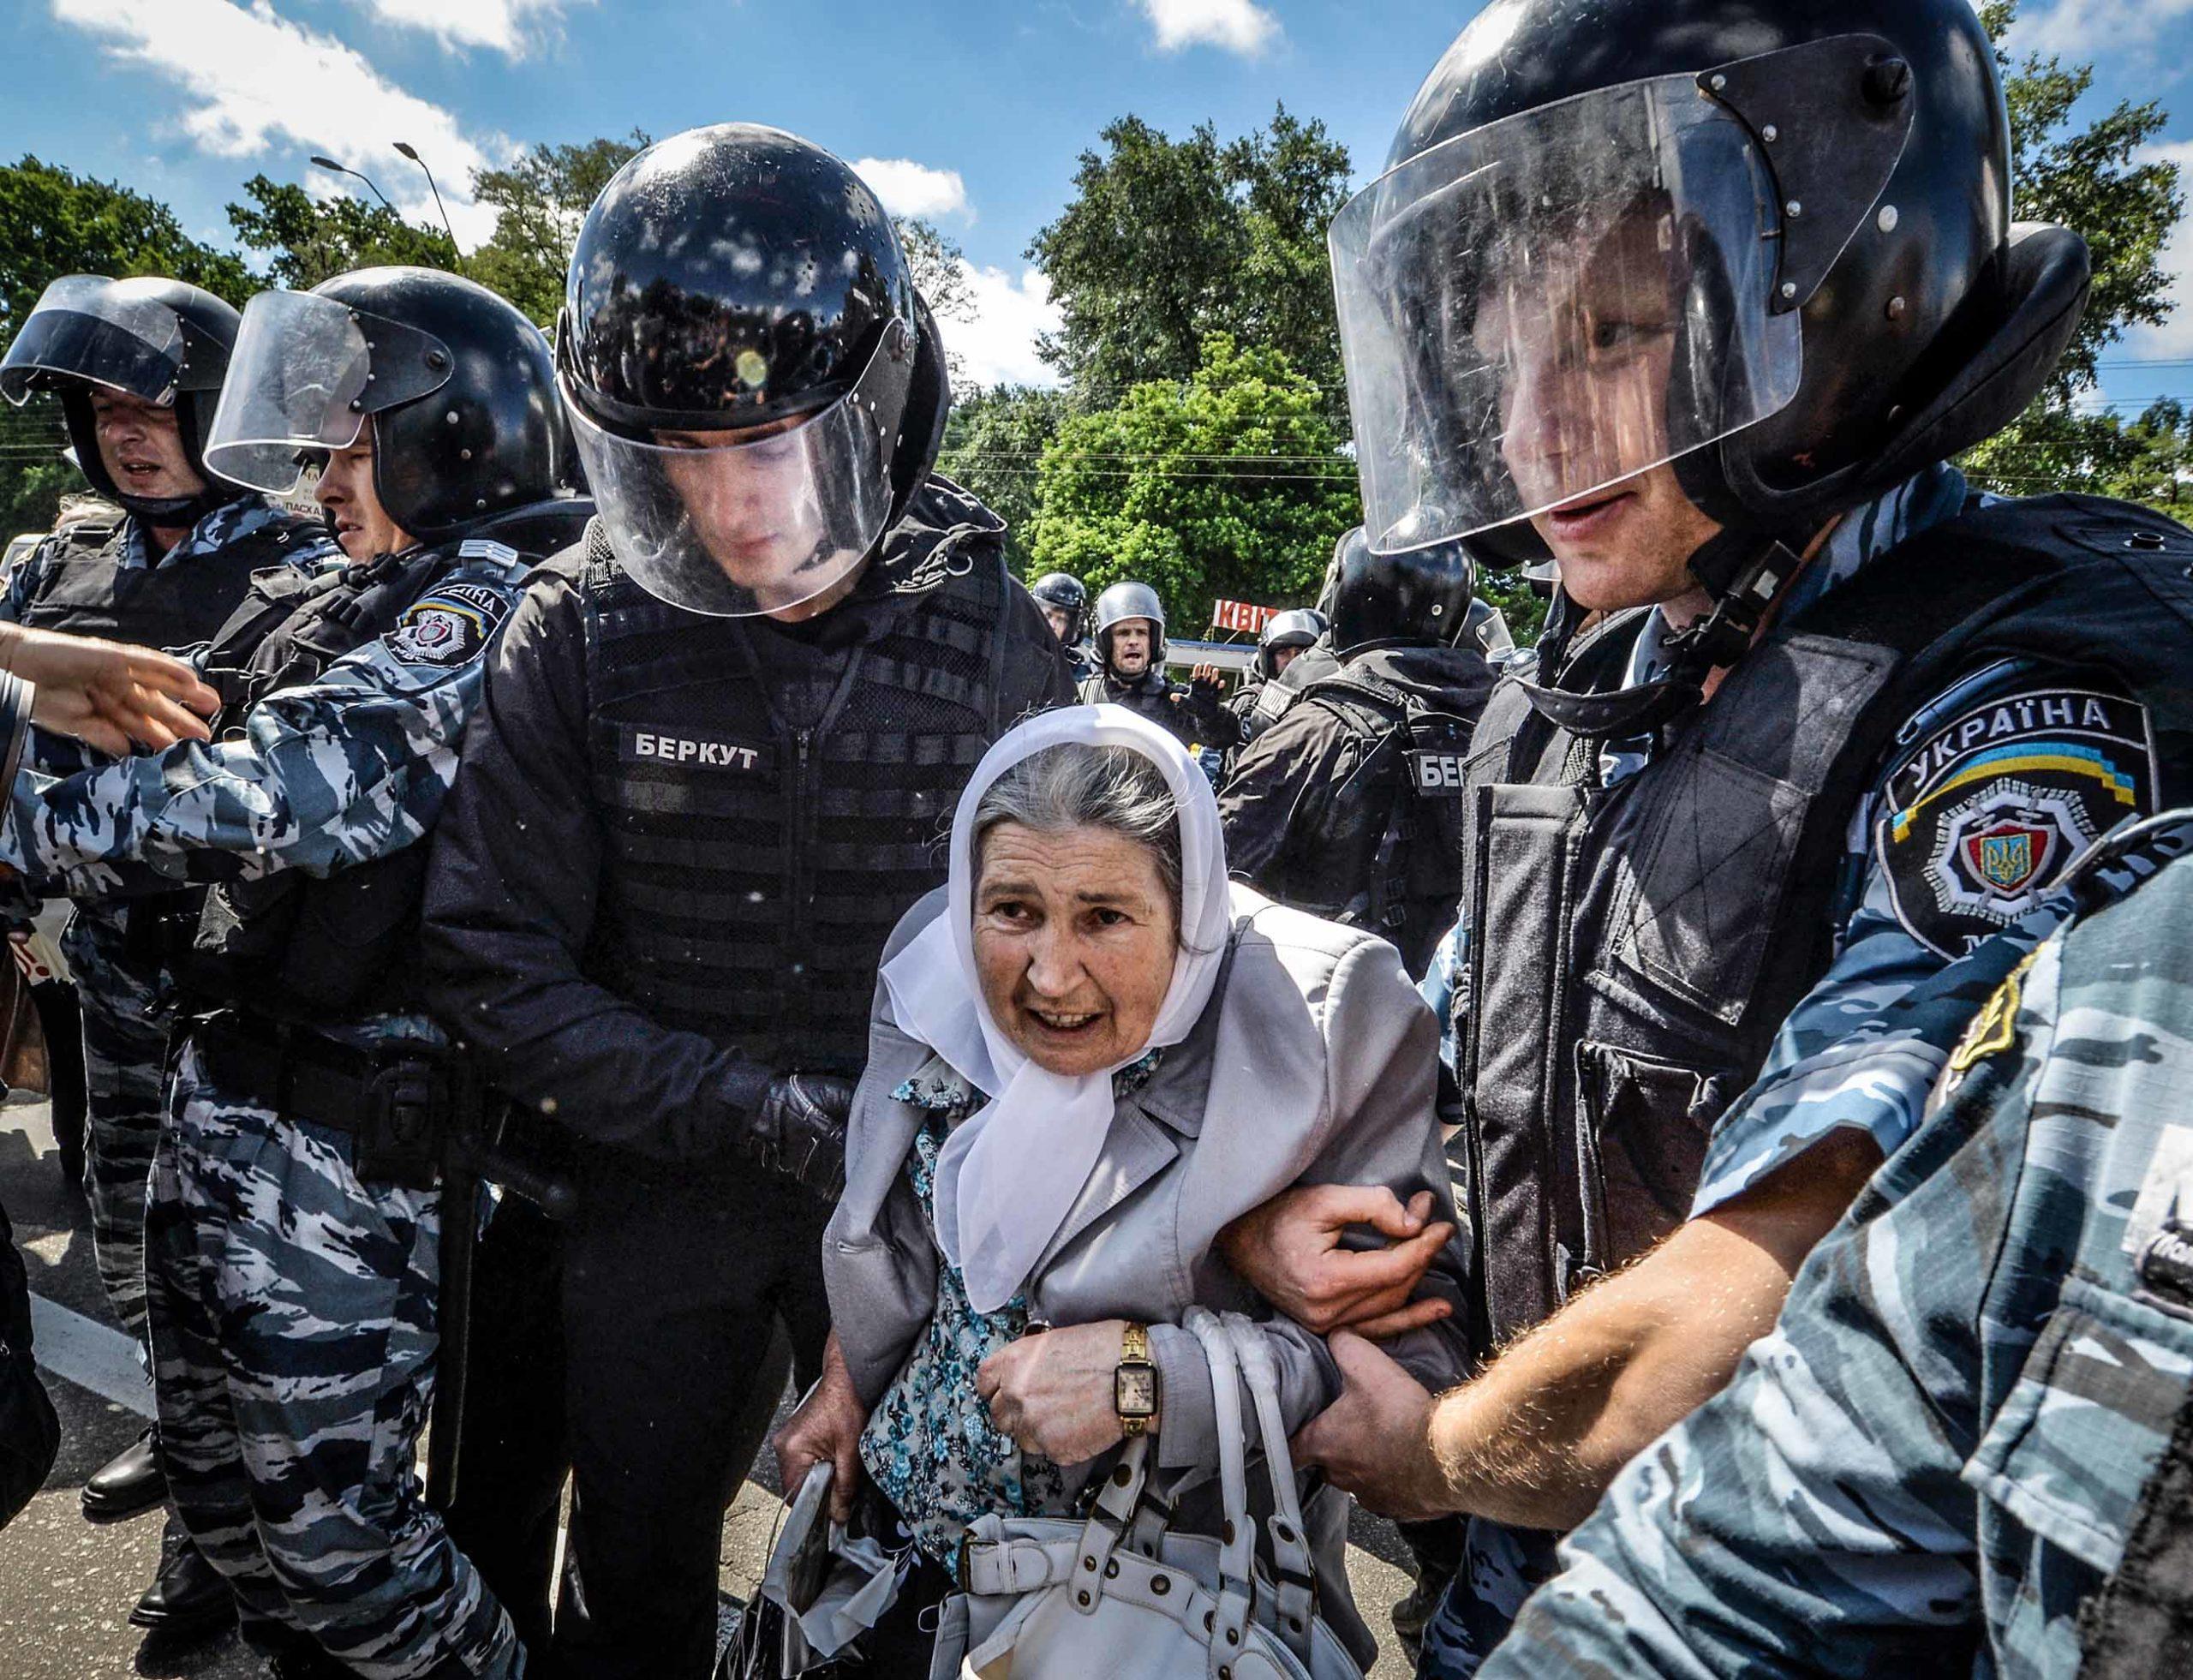 gettyimages 169457833 scaled - <b>«Донбас-квір».</b> Як активіст із Бахмута дав голос ЛГБТ-спільноті Донбасу - Заборона